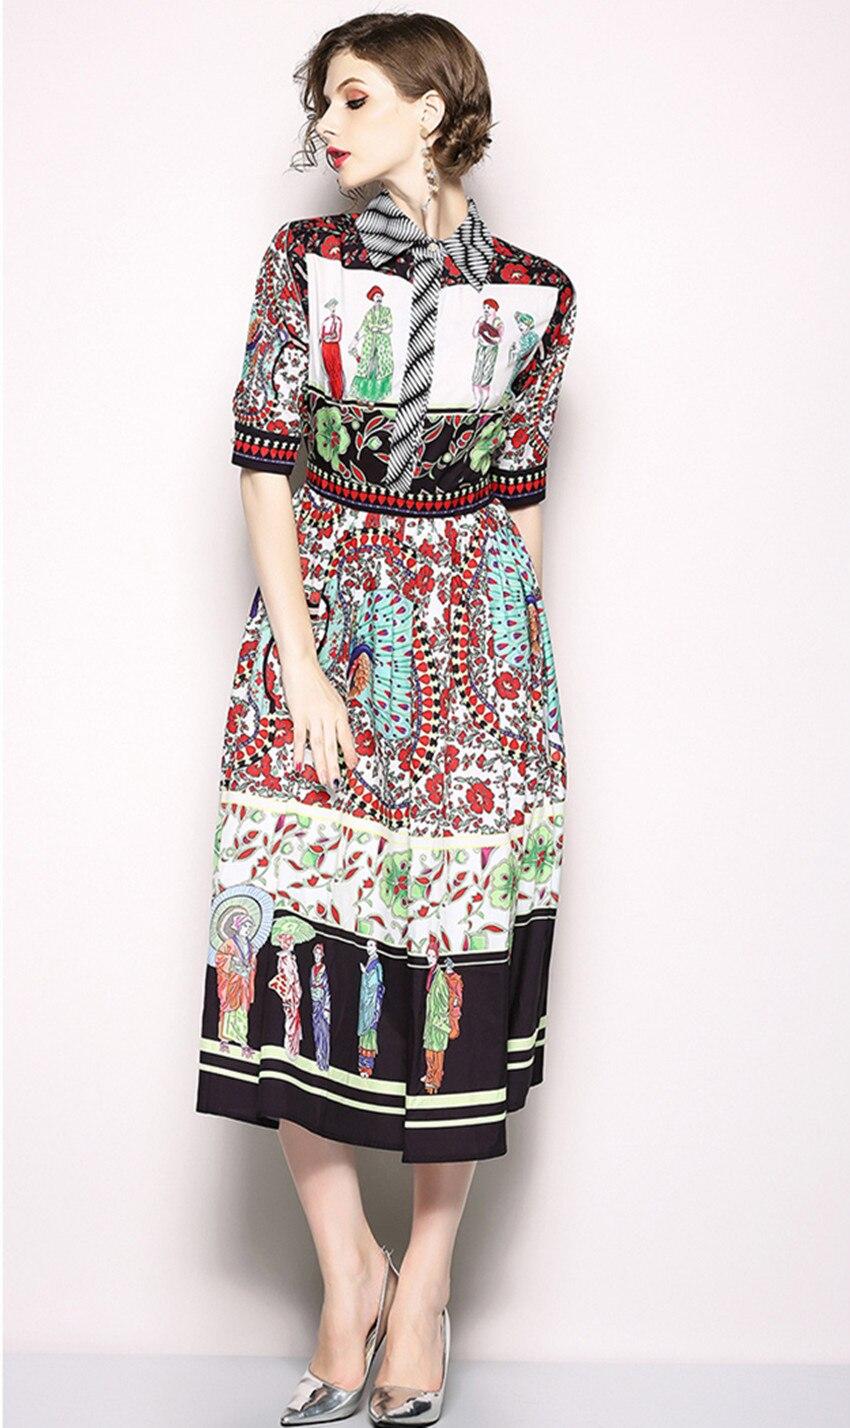 HAMALIEL Vestidos Summer Dress 18 Runway Turn Down Collar Print Flower Character Chiffon Vintage Half Sleeve Ladies Midi Dress 2